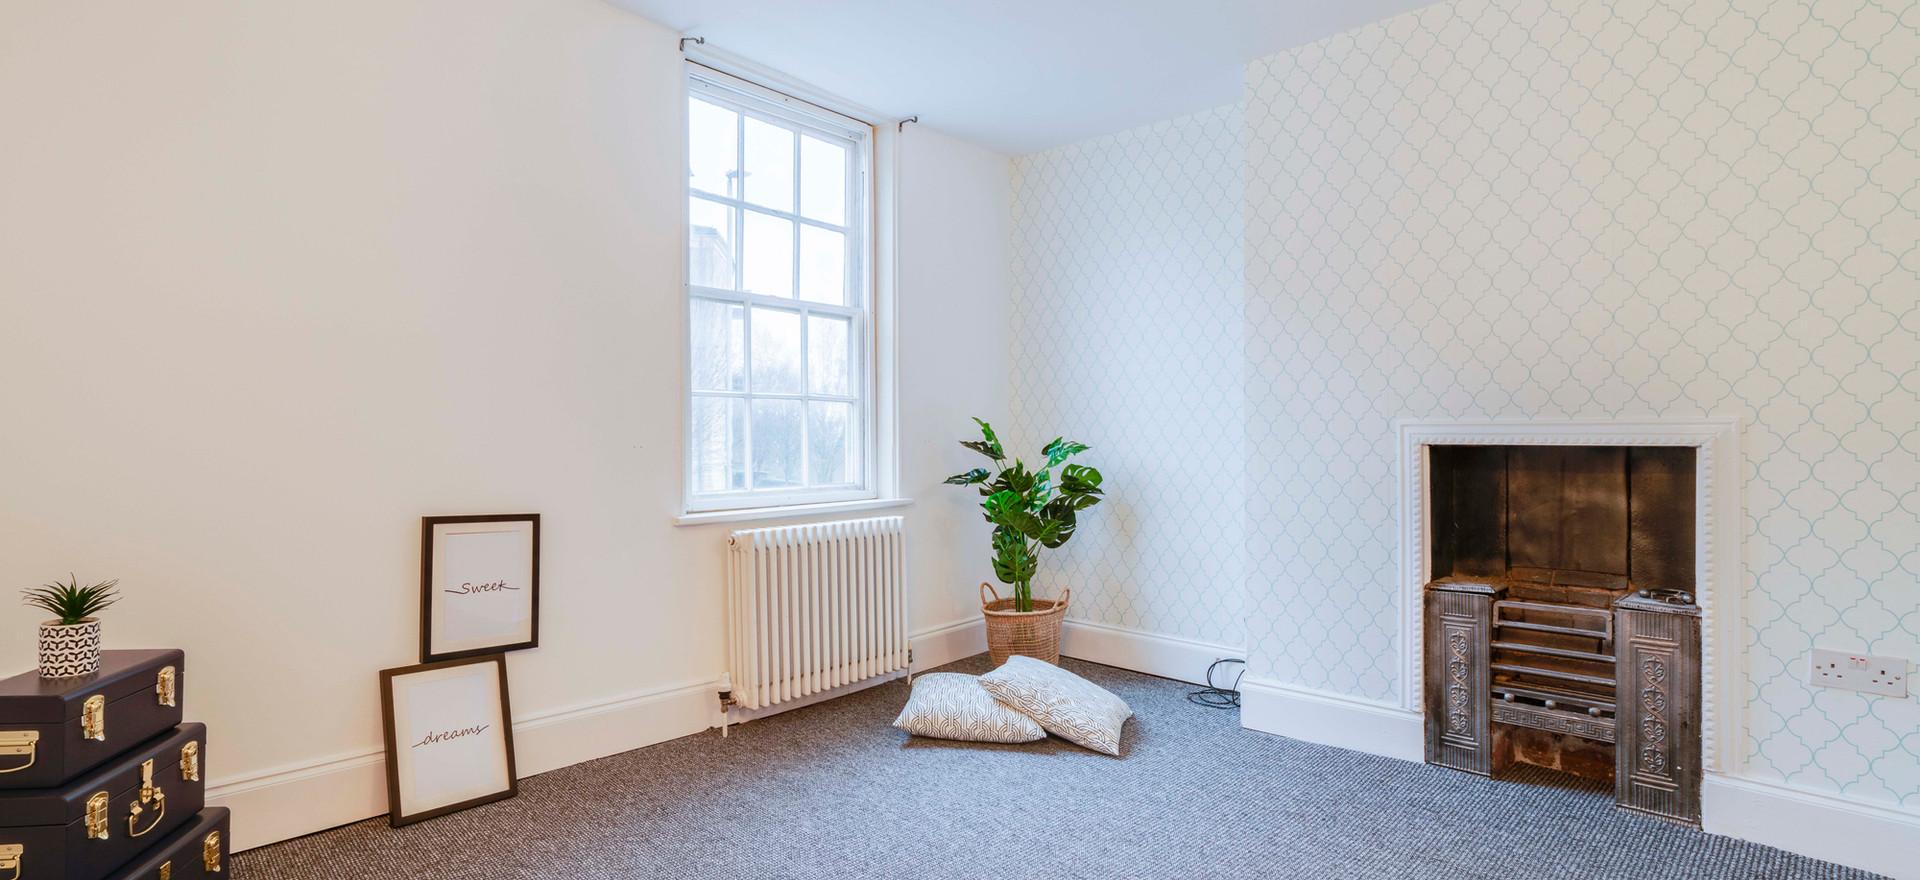 3 Bedroom .jpg